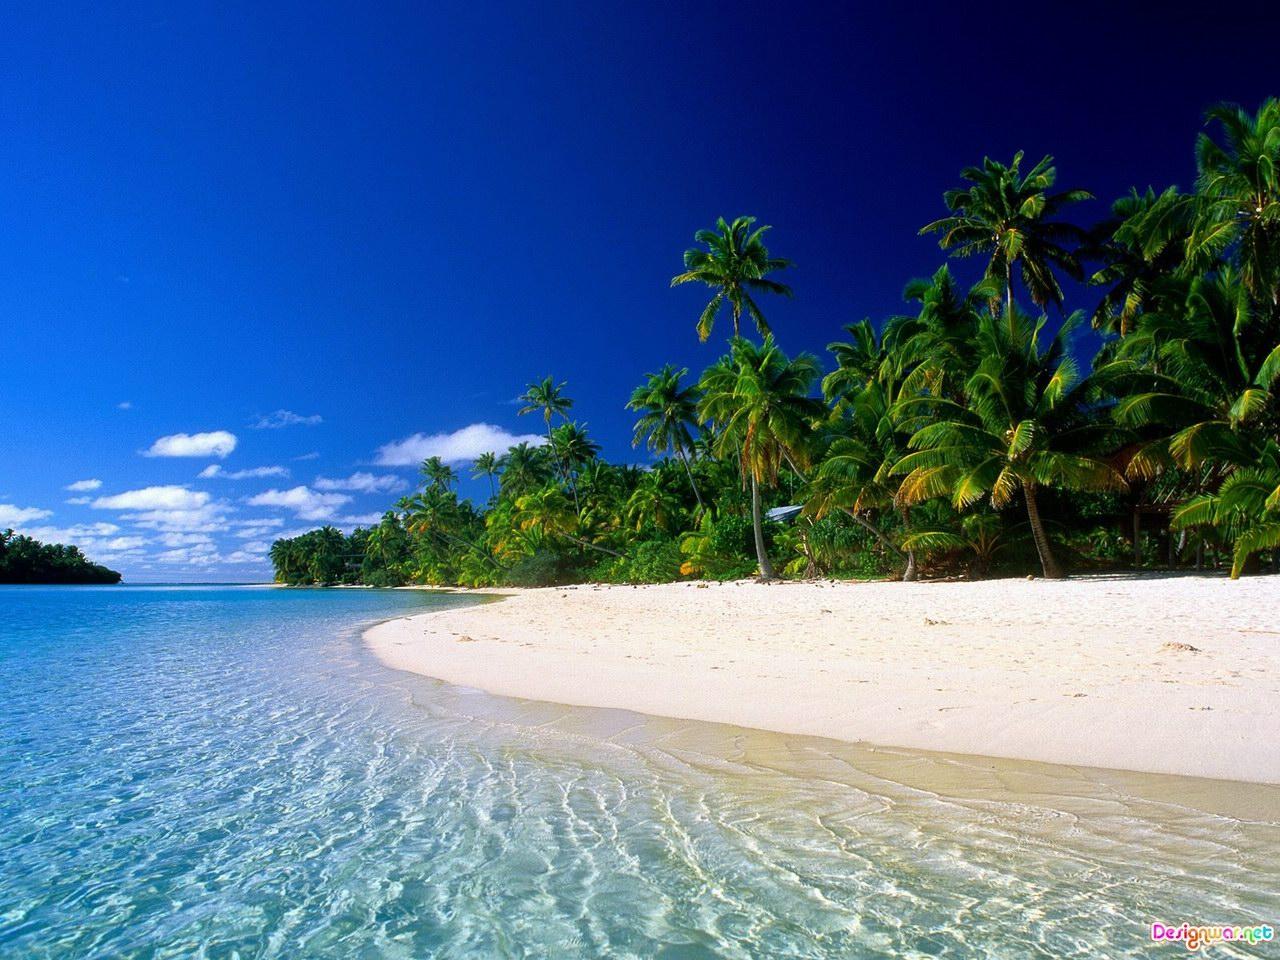 Tropical Beach hd Wallpaper   High Quality Wallpapers,Wallpaper ...